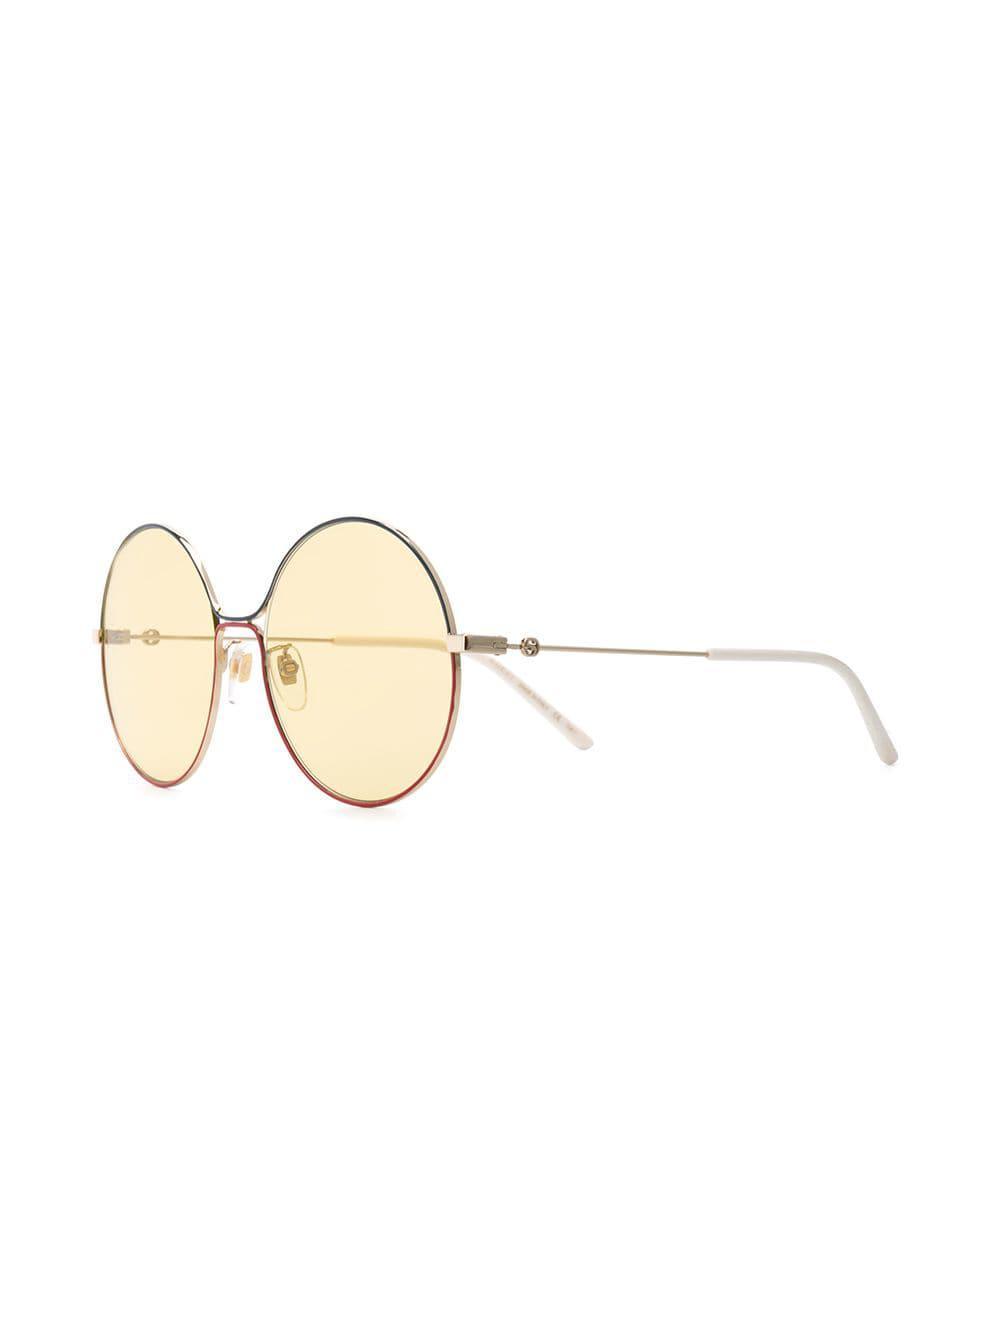 a253f762b01 Lyst - Gucci Round Metal Sunglasses in Metallic